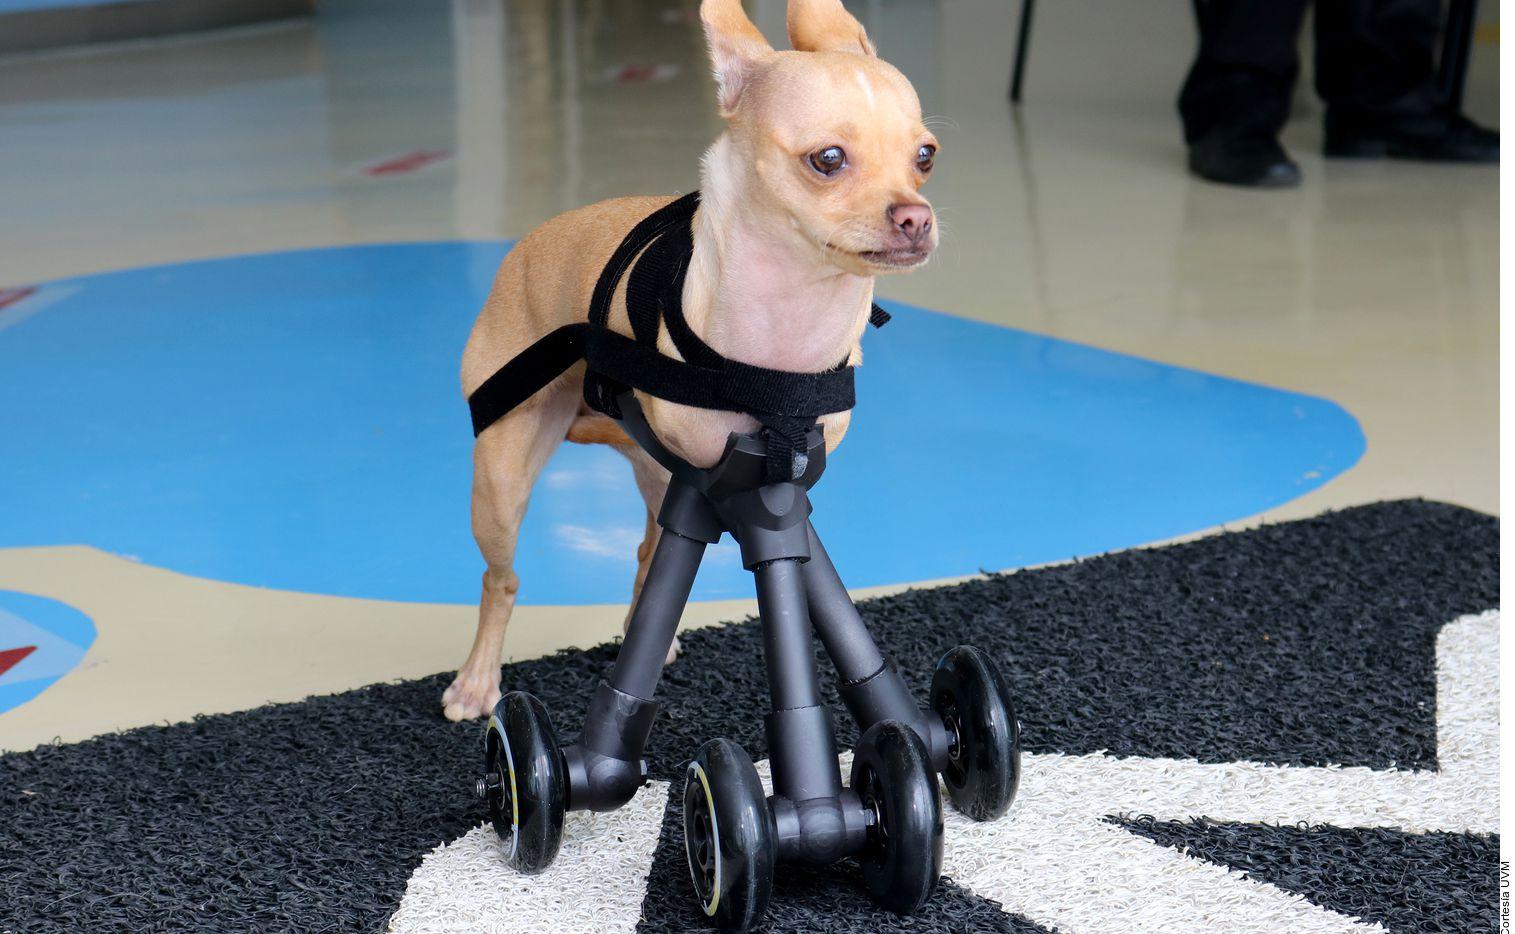 Guzzi es una perrita chihuahua de 1 año.